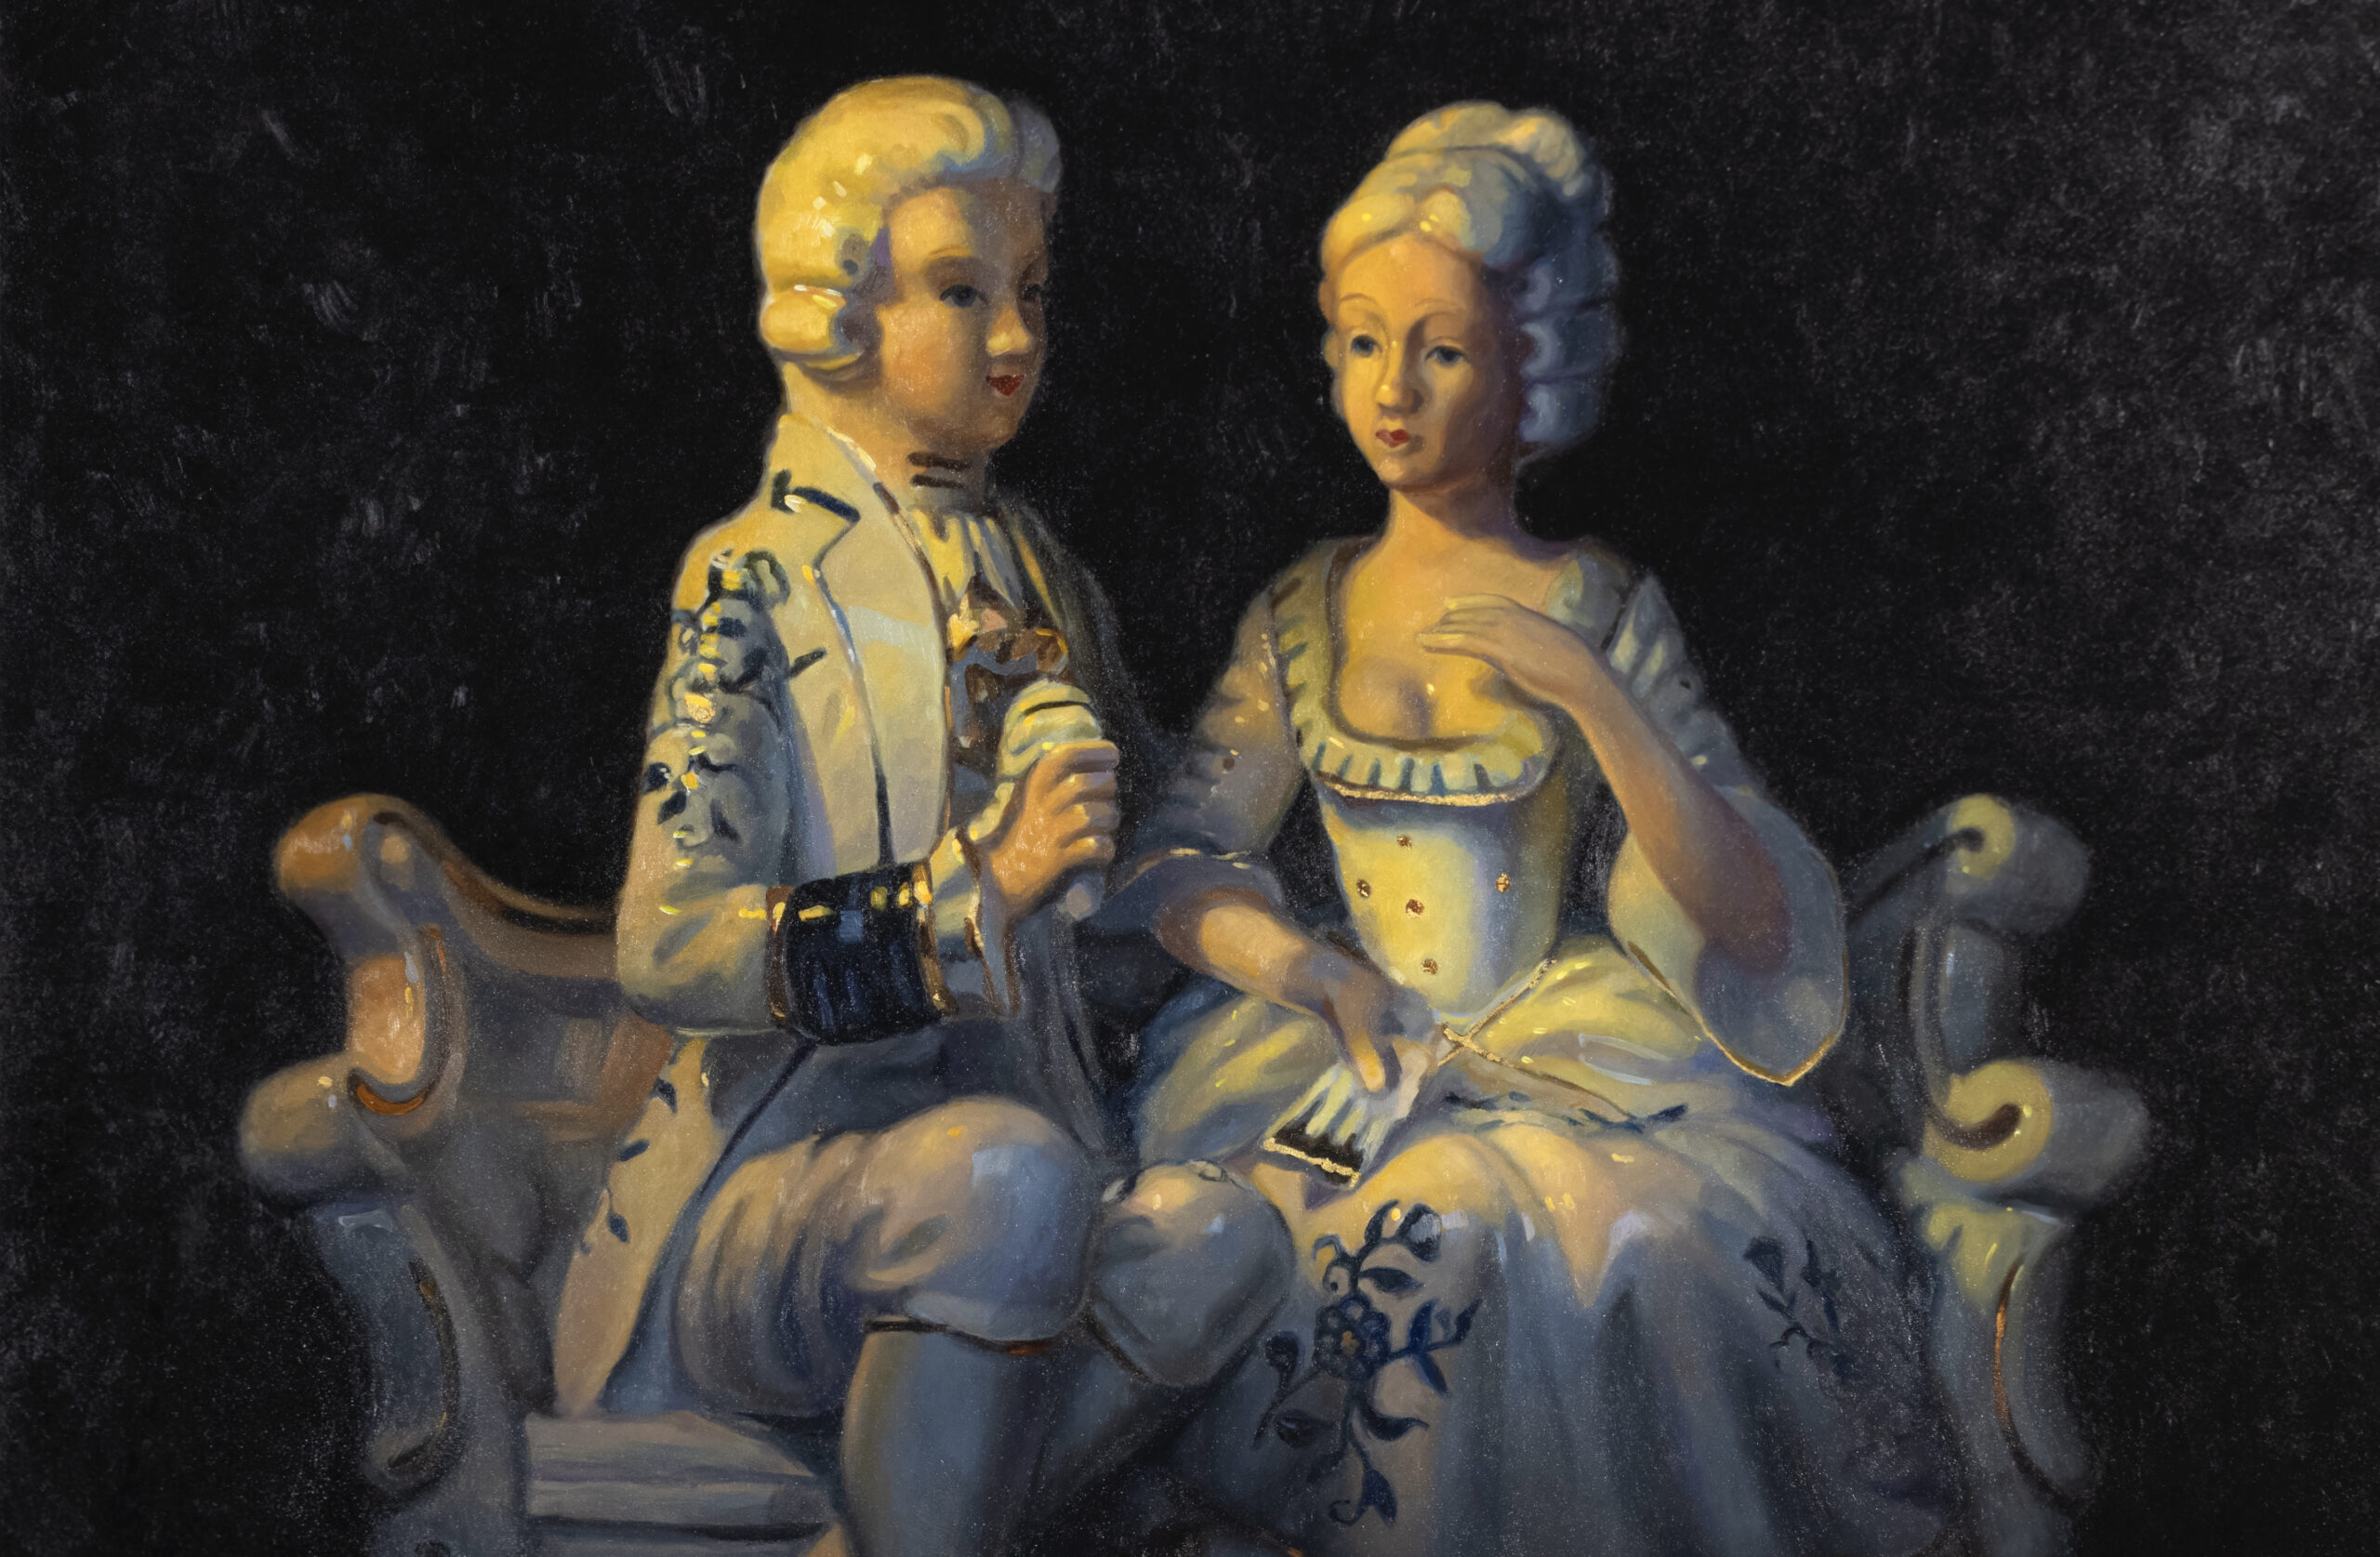 Gilded romance